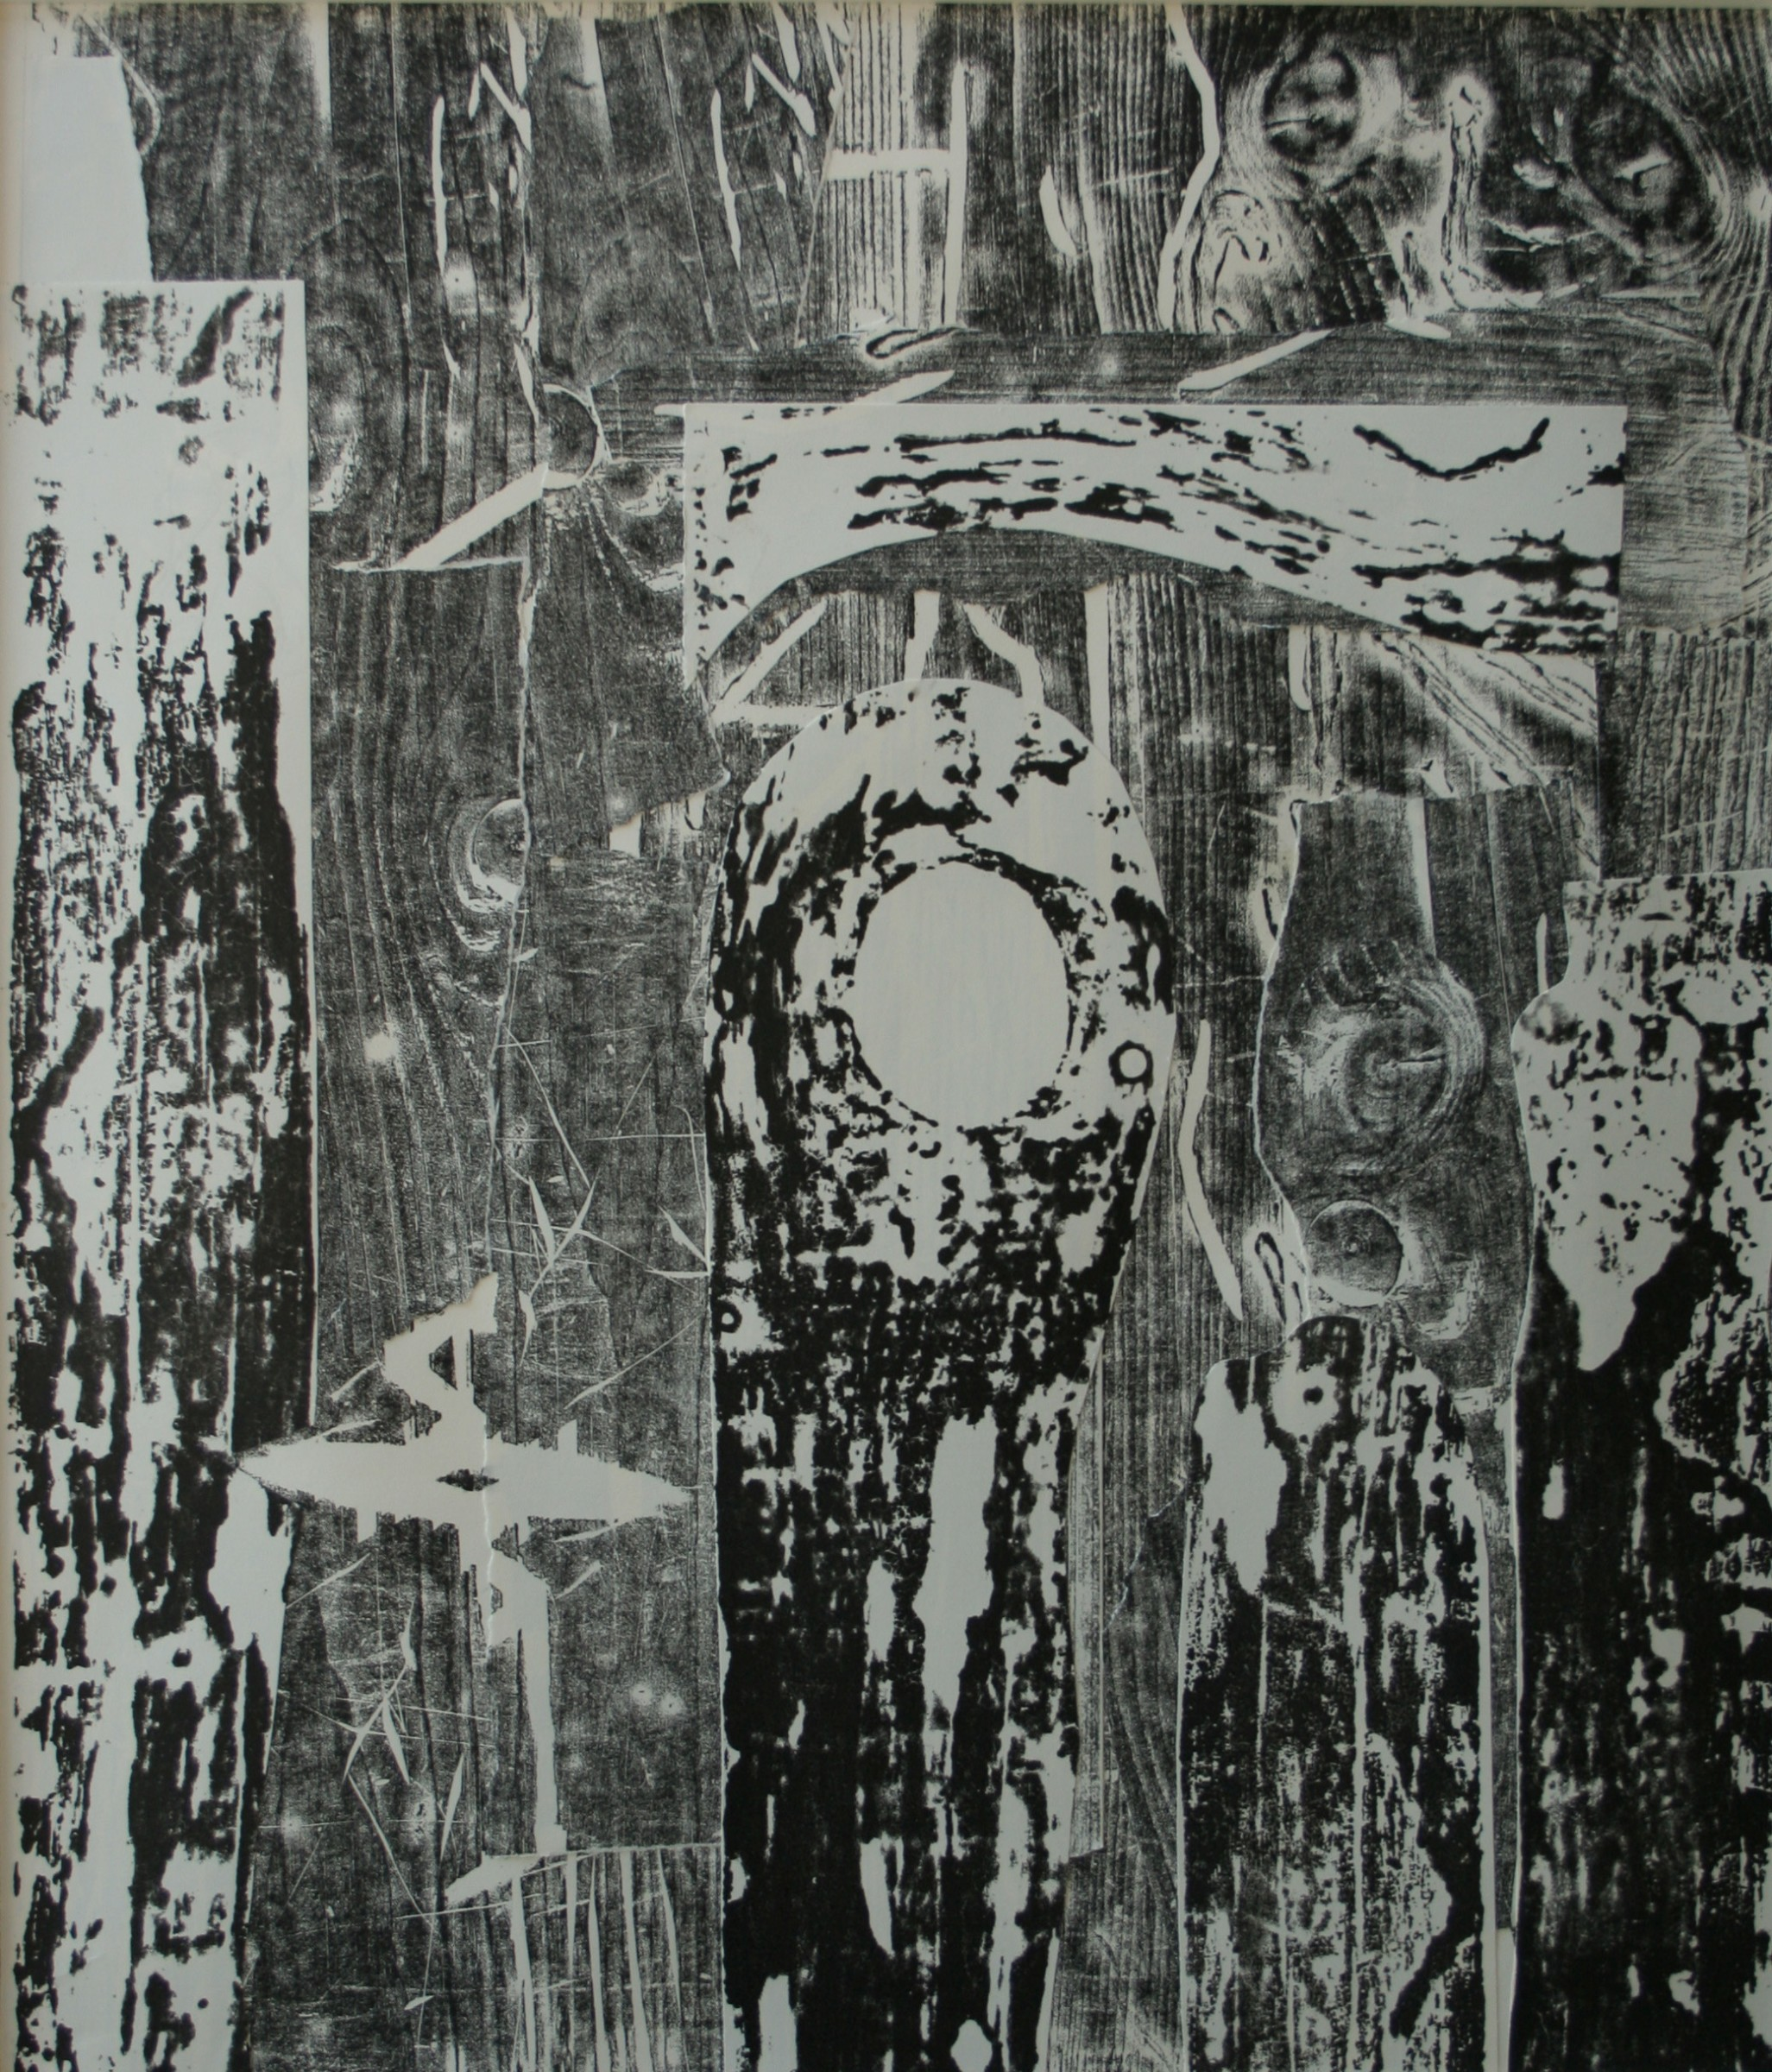 "<span class=""link fancybox-details-link""><a href=""/exhibitions/18/works/image_standalone1052/"">View Detail Page</a></span><p>Francis Tinsley RE</p><p>The Conversation</p><p>woodcut / collage</p><p>65 x 60cm</p><p>£490</p><p></p>"